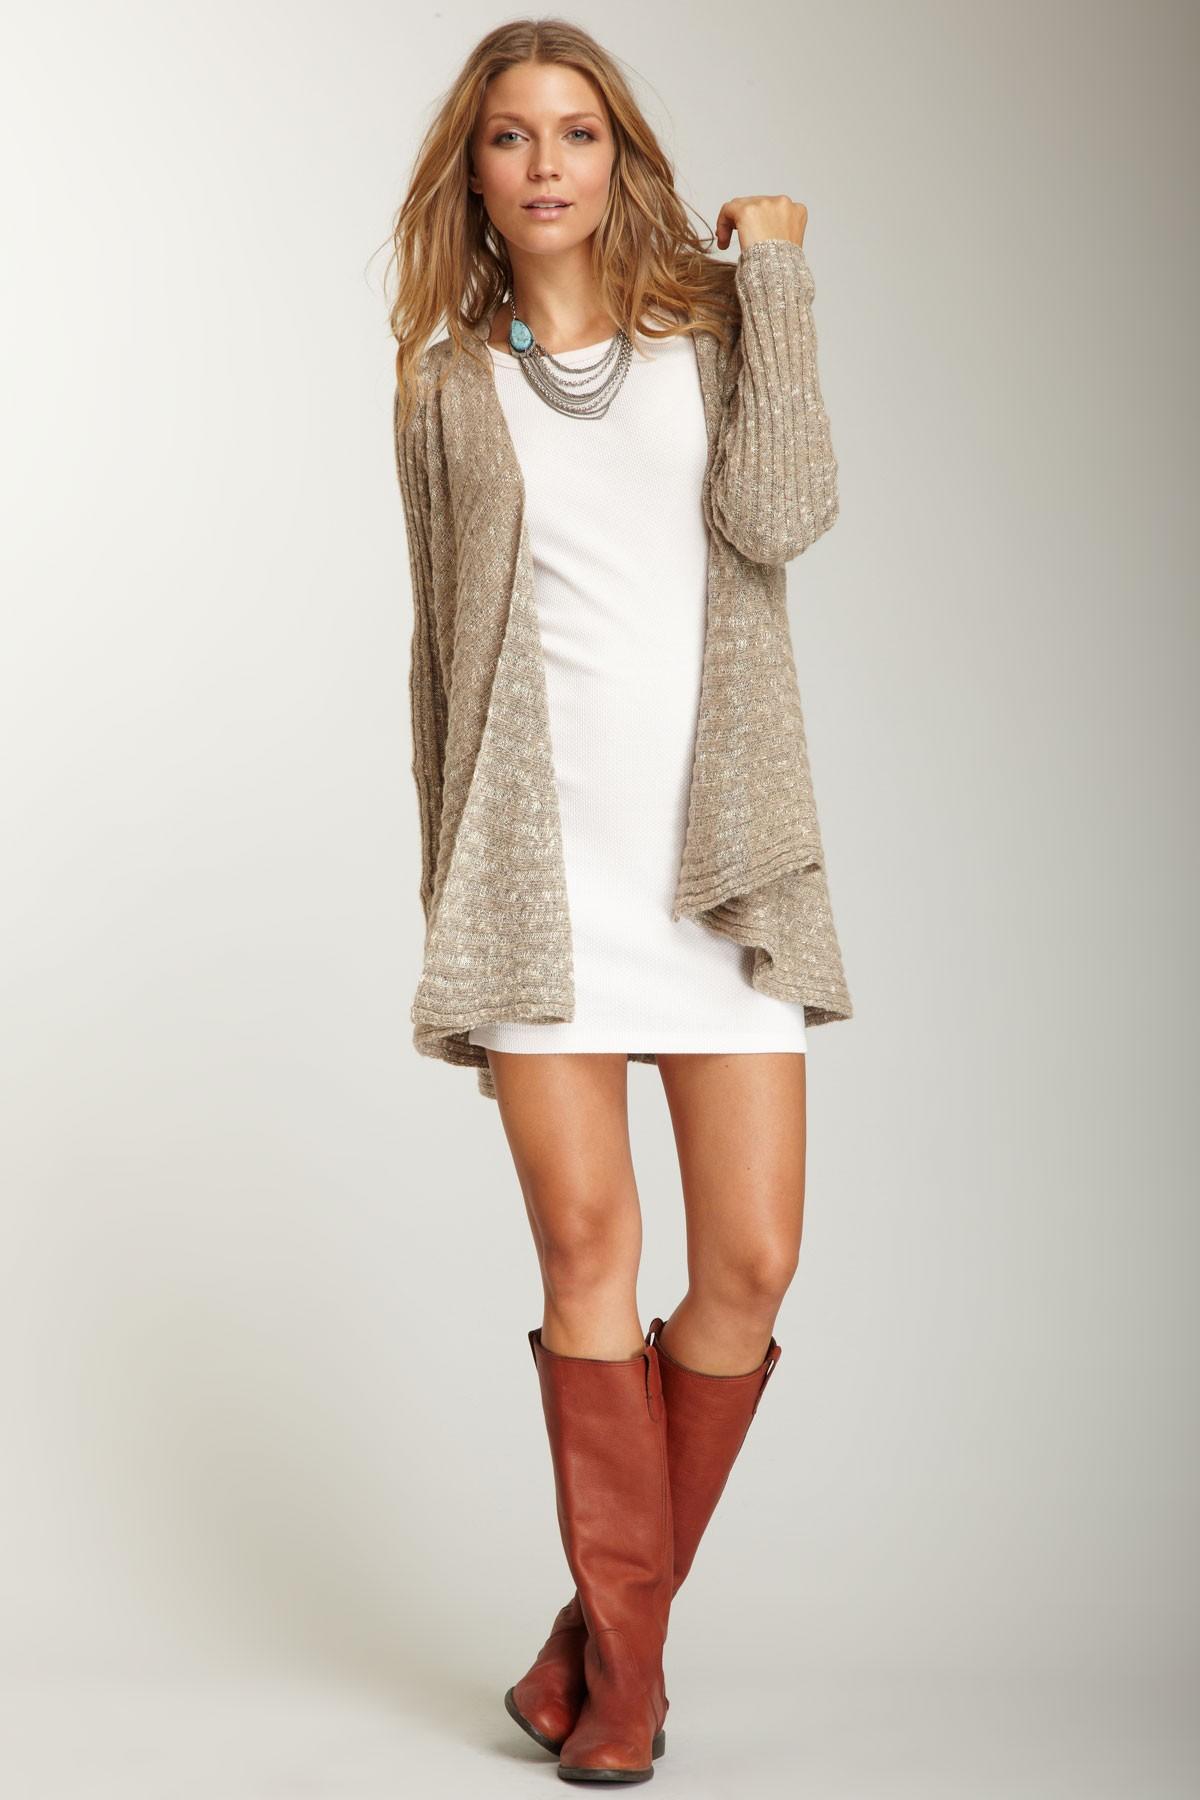 b11273c29 15 Best Ways to Wear Long Cardigan Sweater - FMag.com